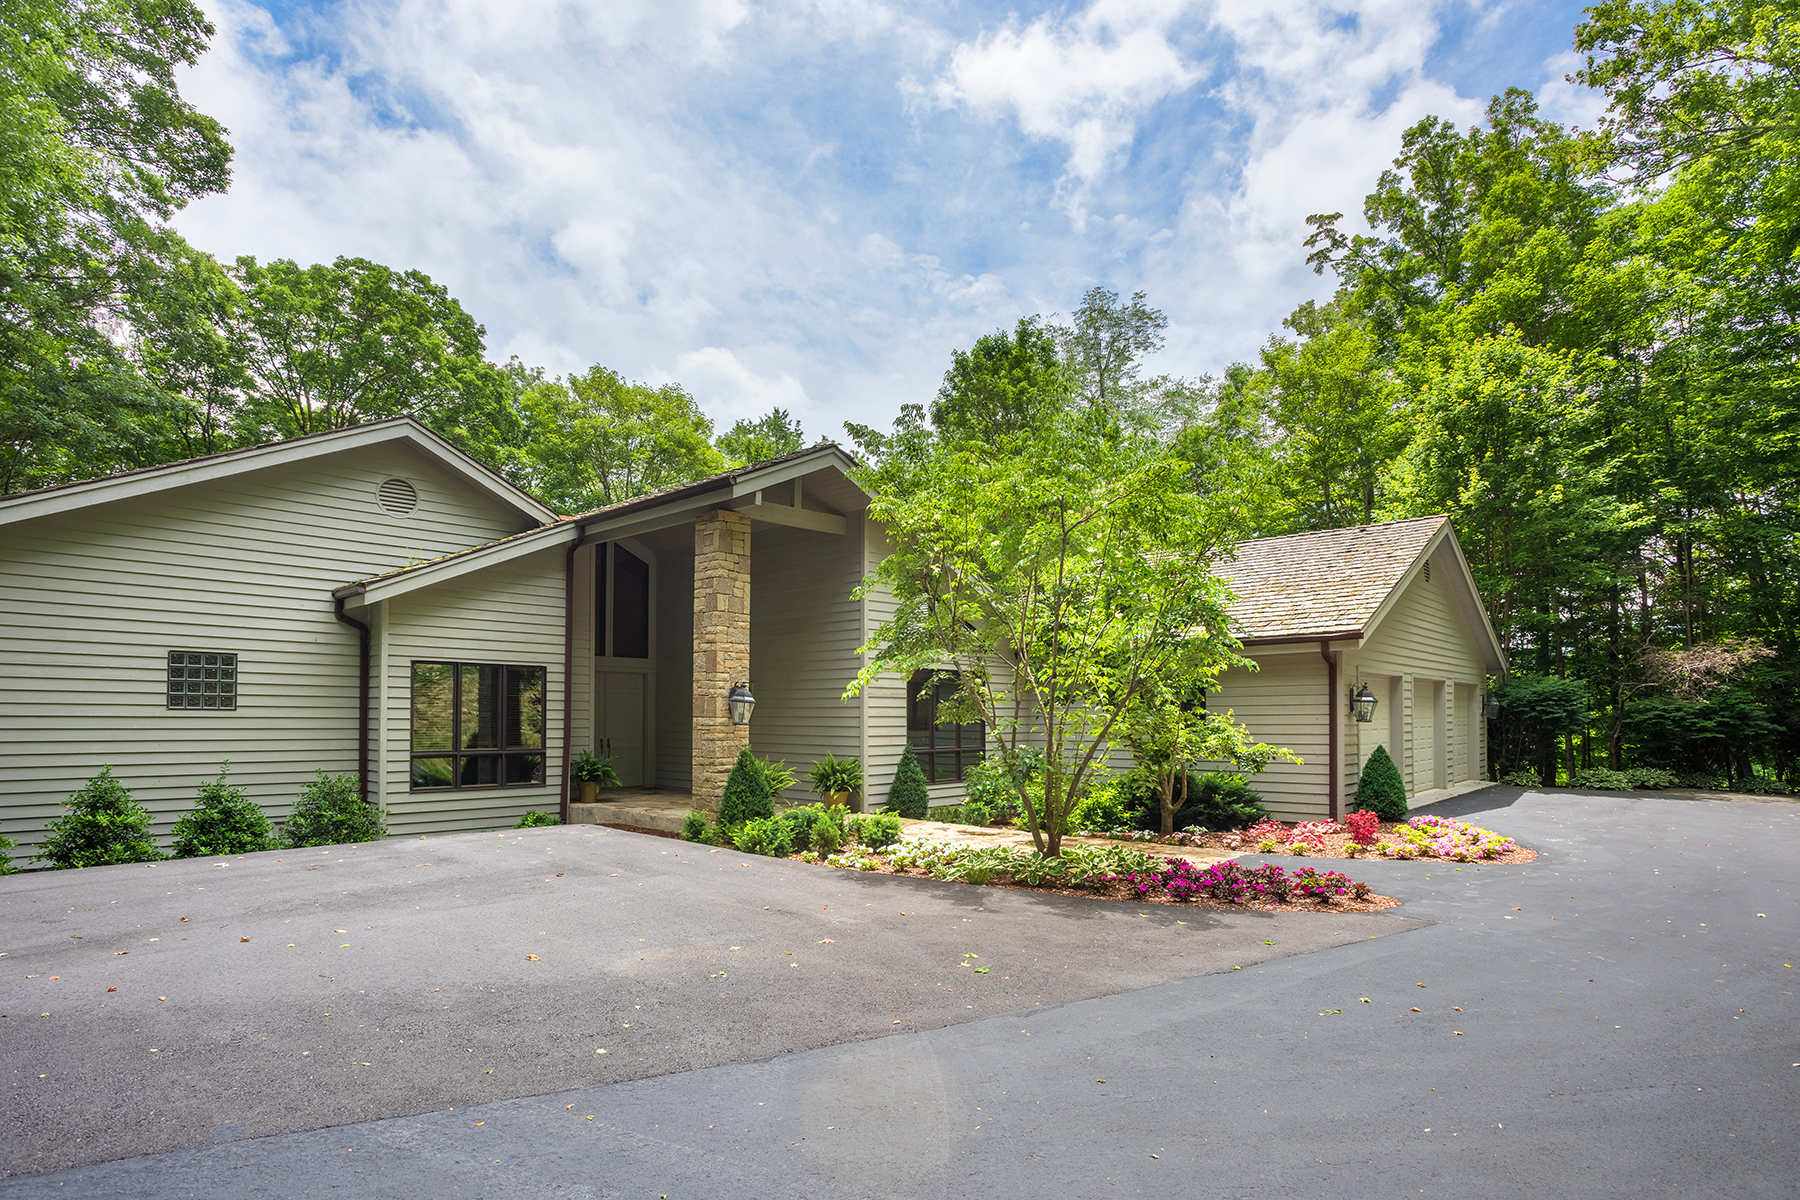 Single Family Home for Sale at LINVILLE - LINVILLE RIDGE 703 Ridge Court Linville, North Carolina, 28646 United States